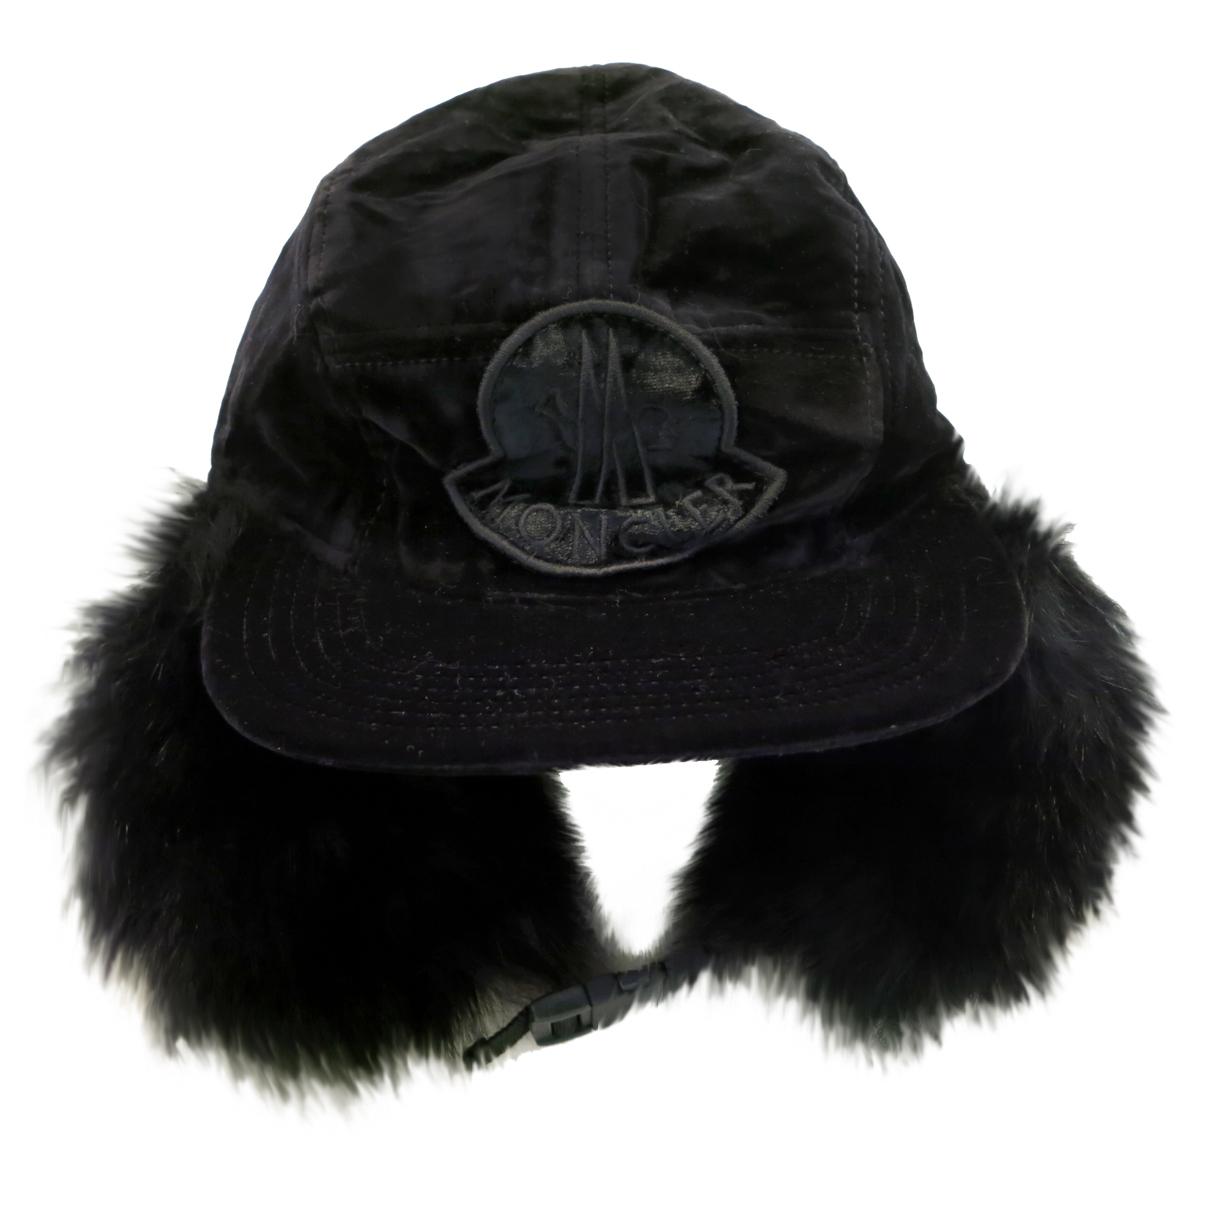 Moncler N Black Cotton hat for Women S International